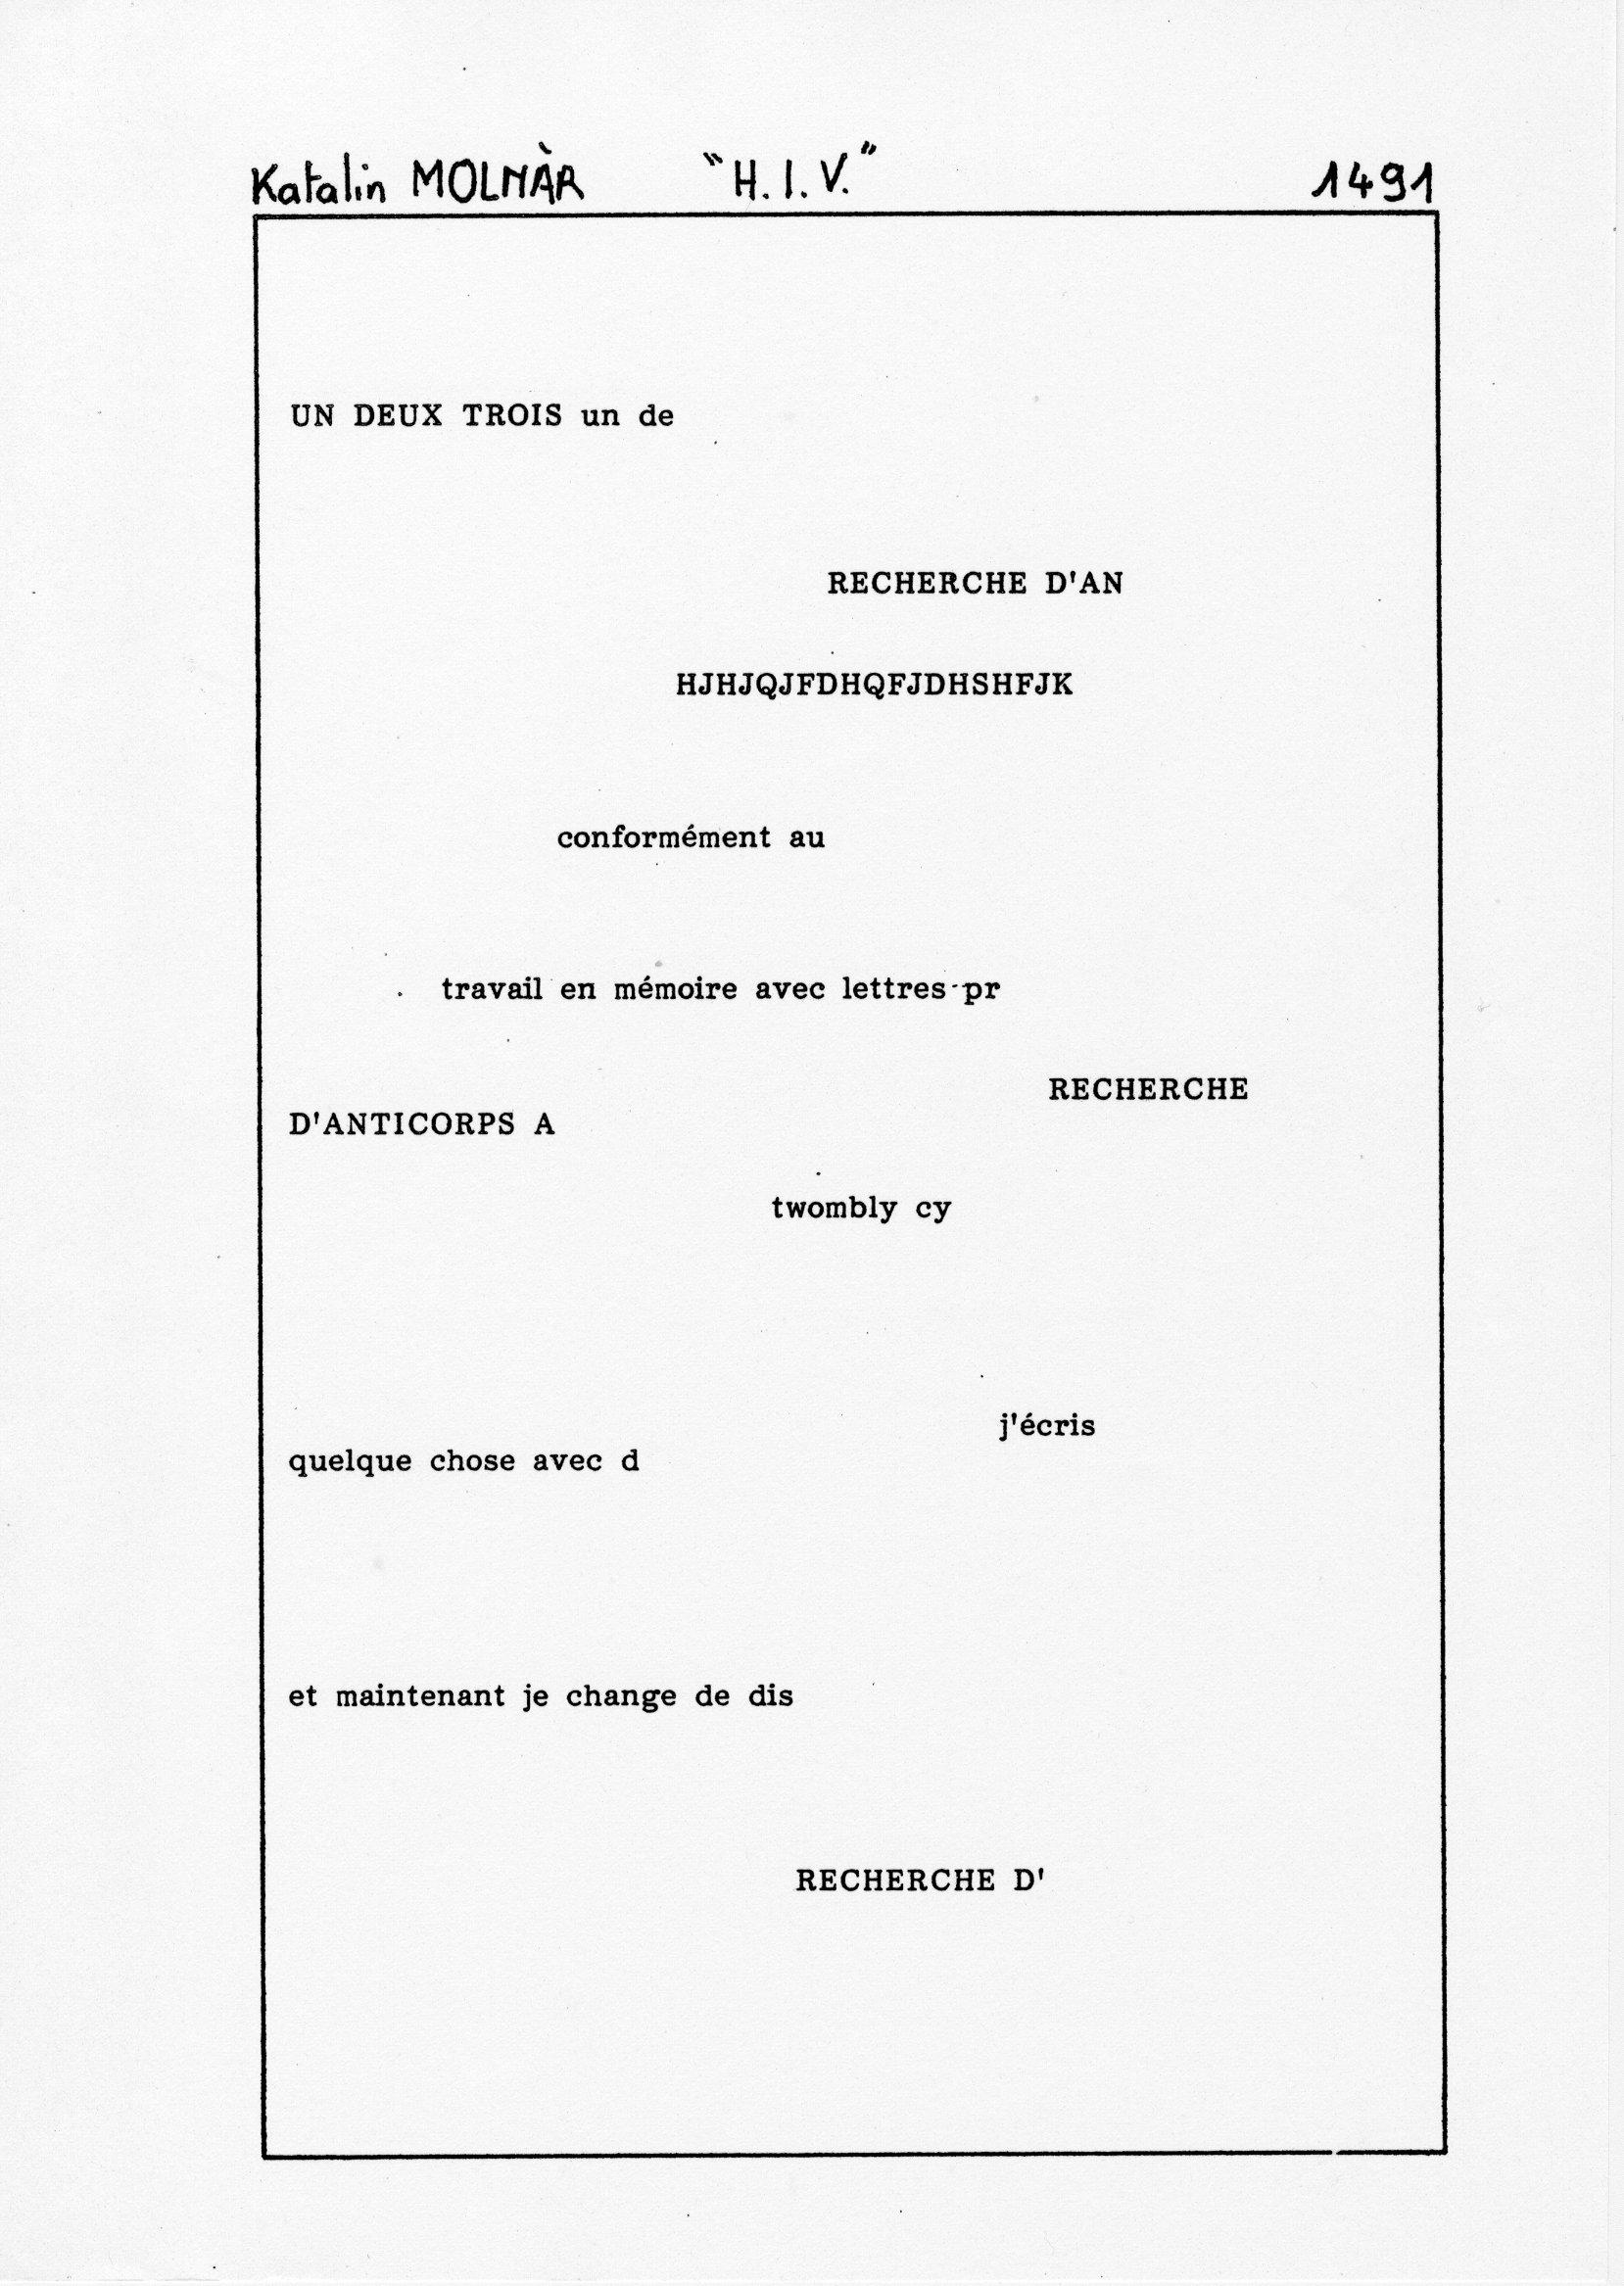 page 1491 K. Molnar H.I.V.